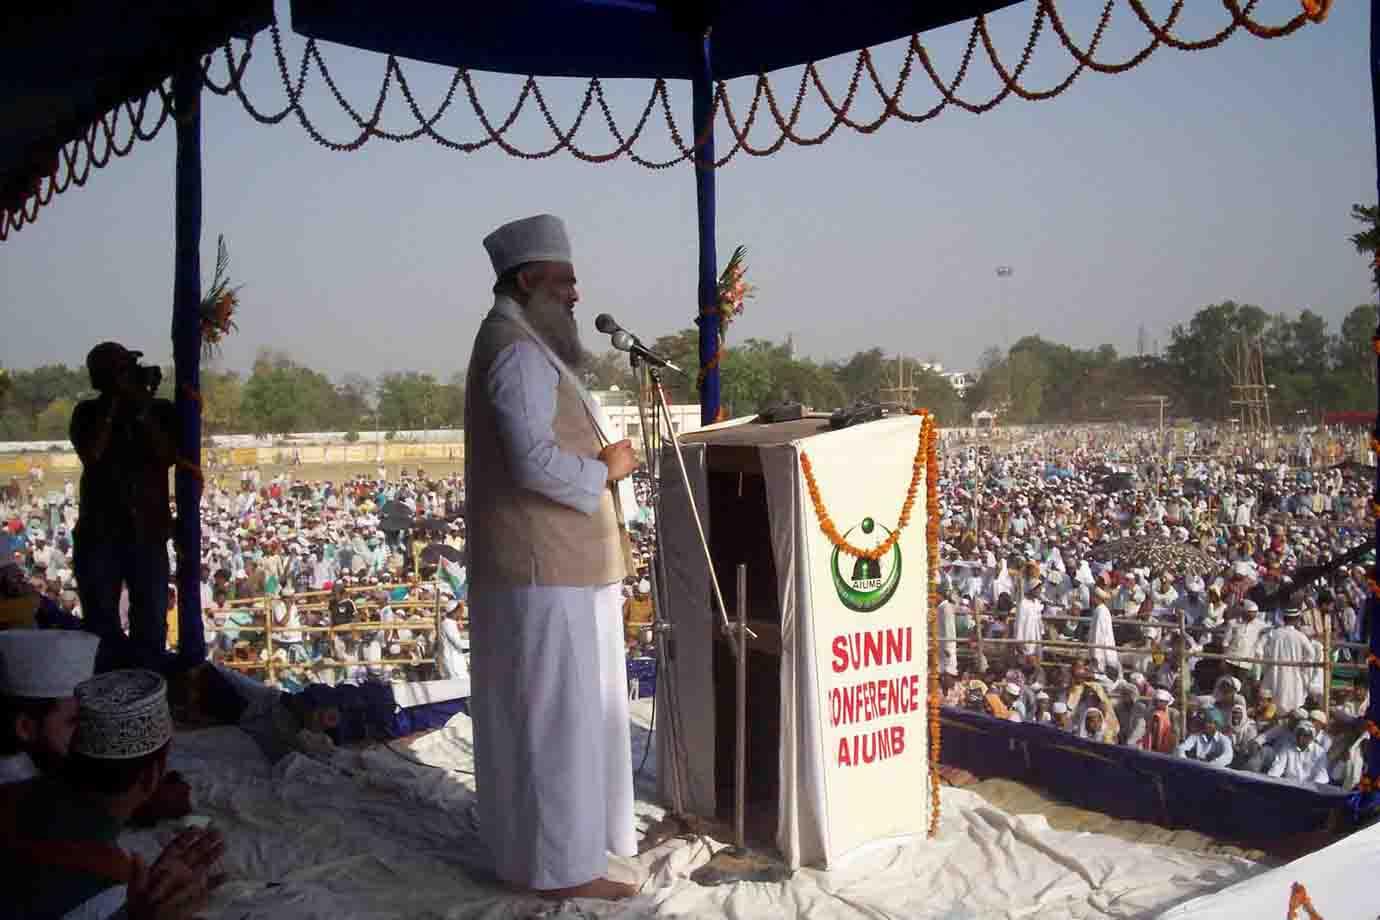 Sunni Conference,Bhagalpur,Bihar, 16th May, 2010